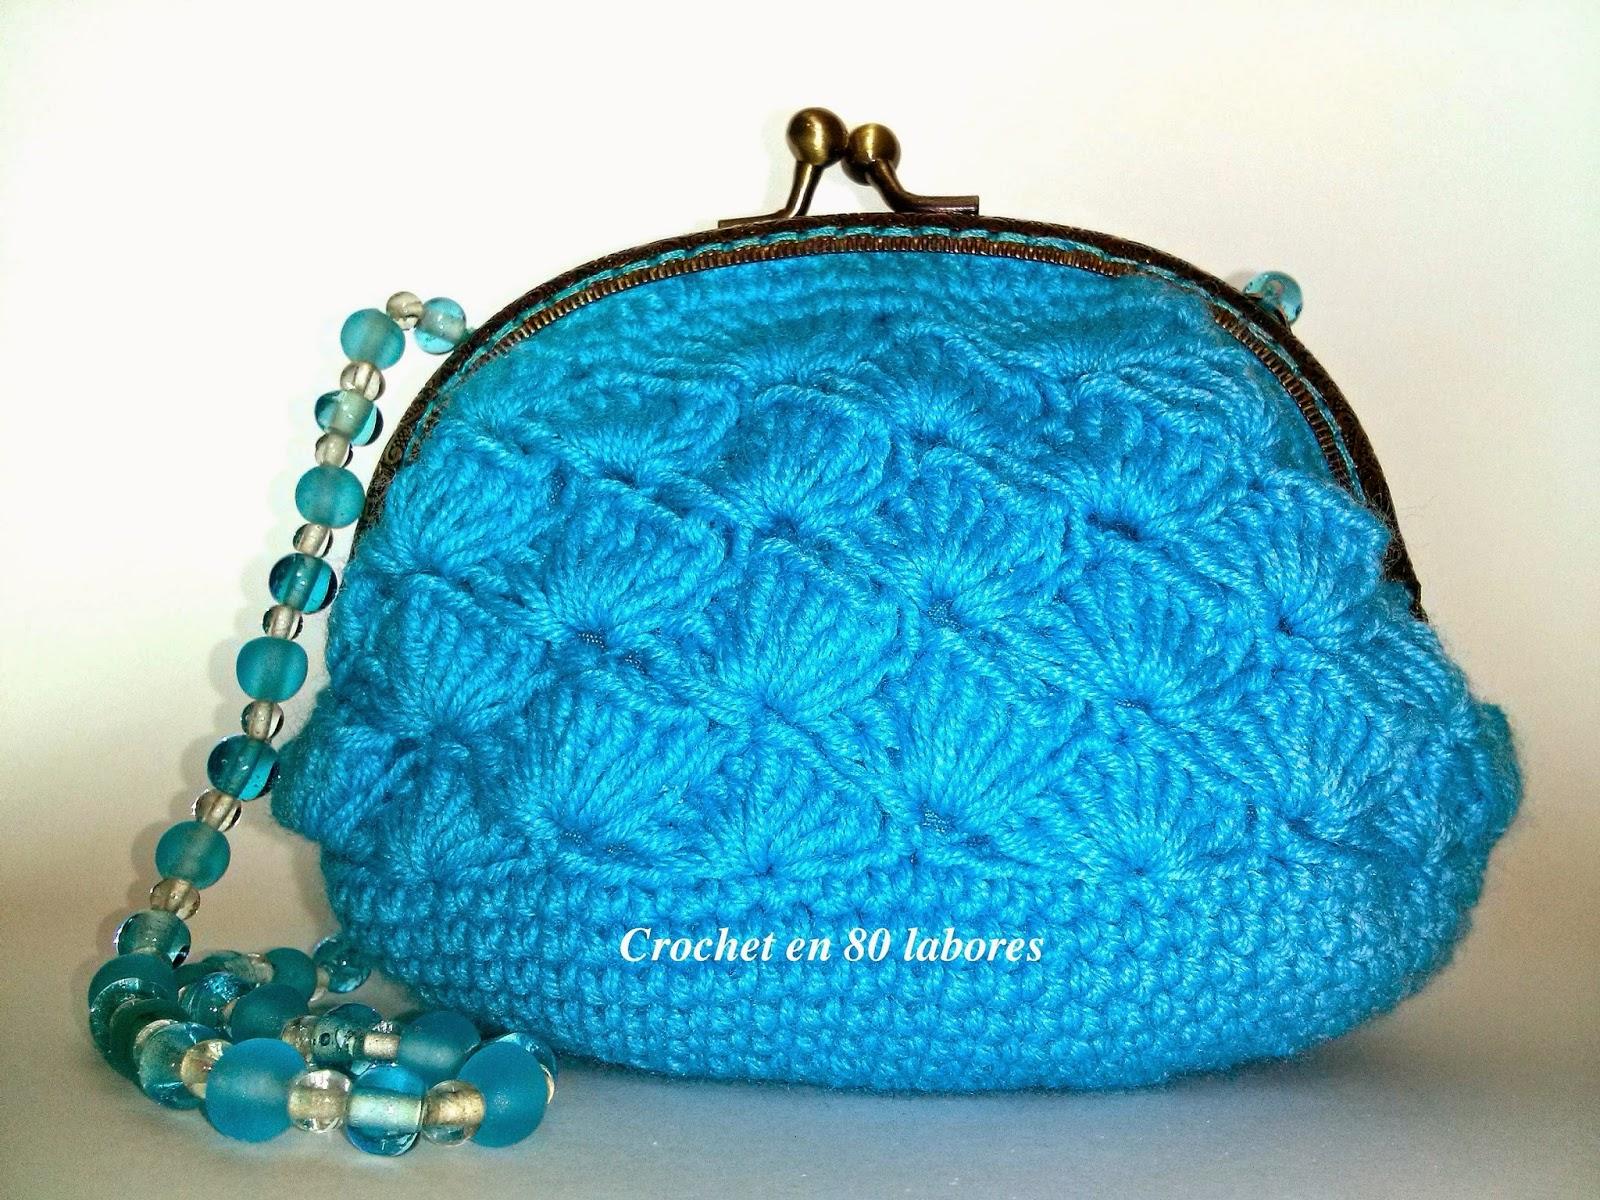 Monedero Ganchillo Boquilla Ovalada Of Crochet En 80 Labores Un Monedero De Fiesta De Ganchillo